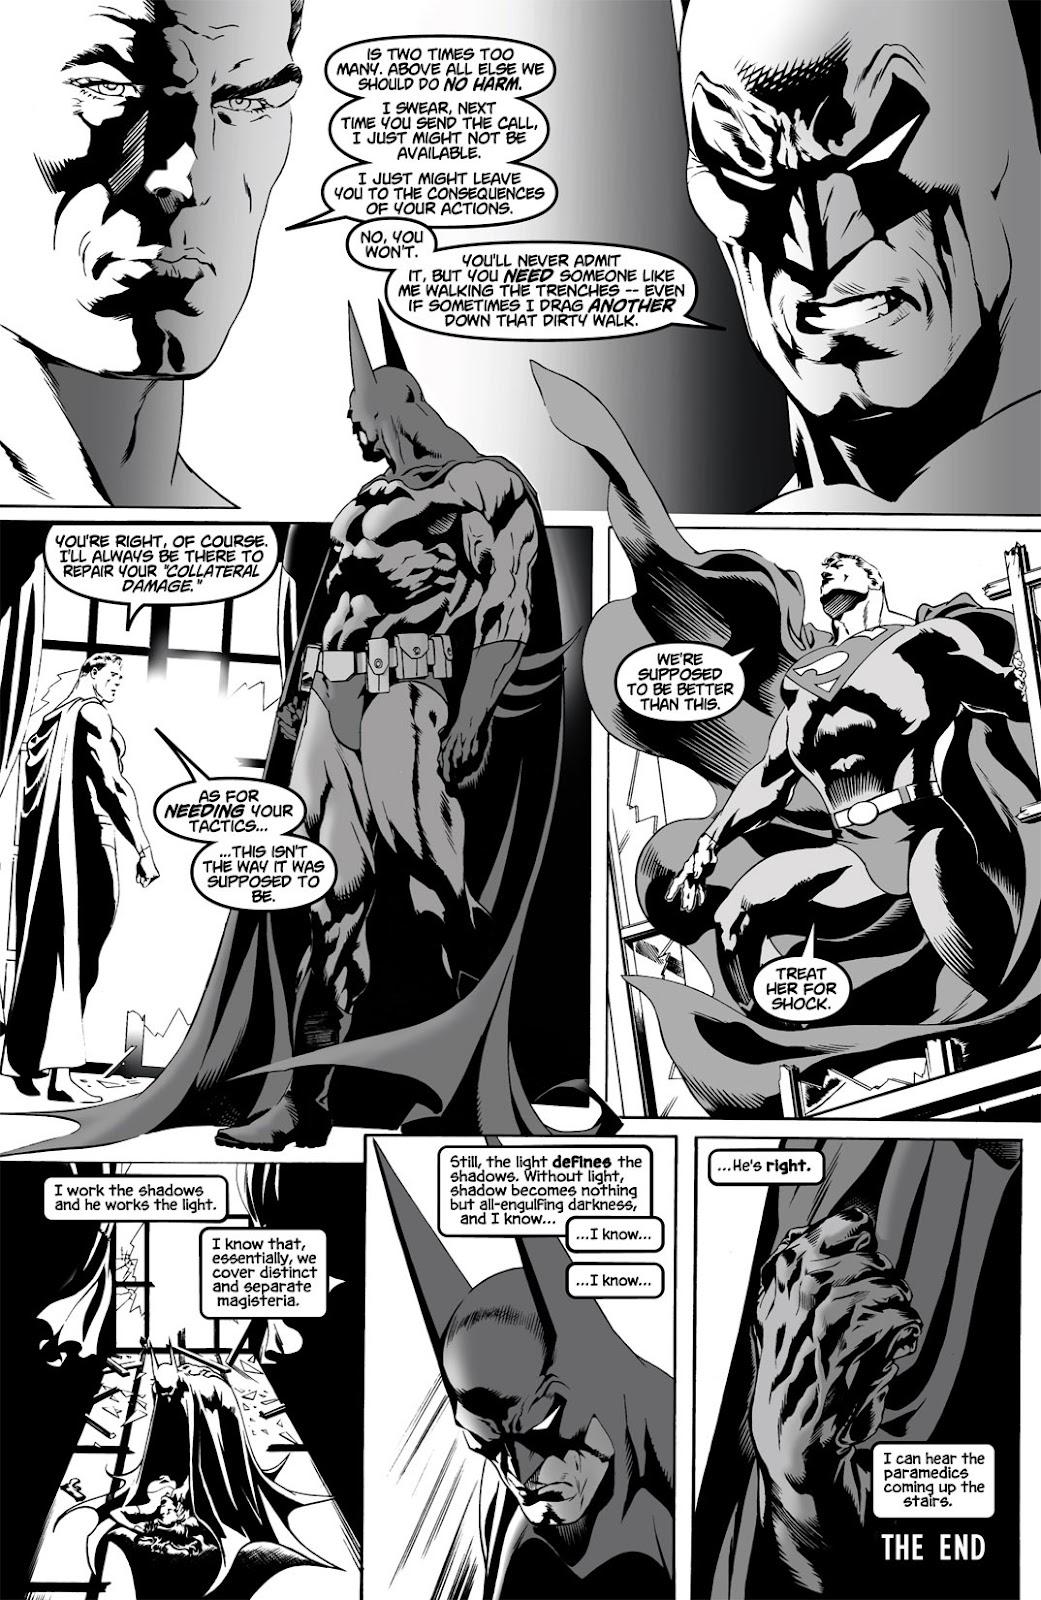 Batman Gotham Knights | Viewcomic reading comics online for